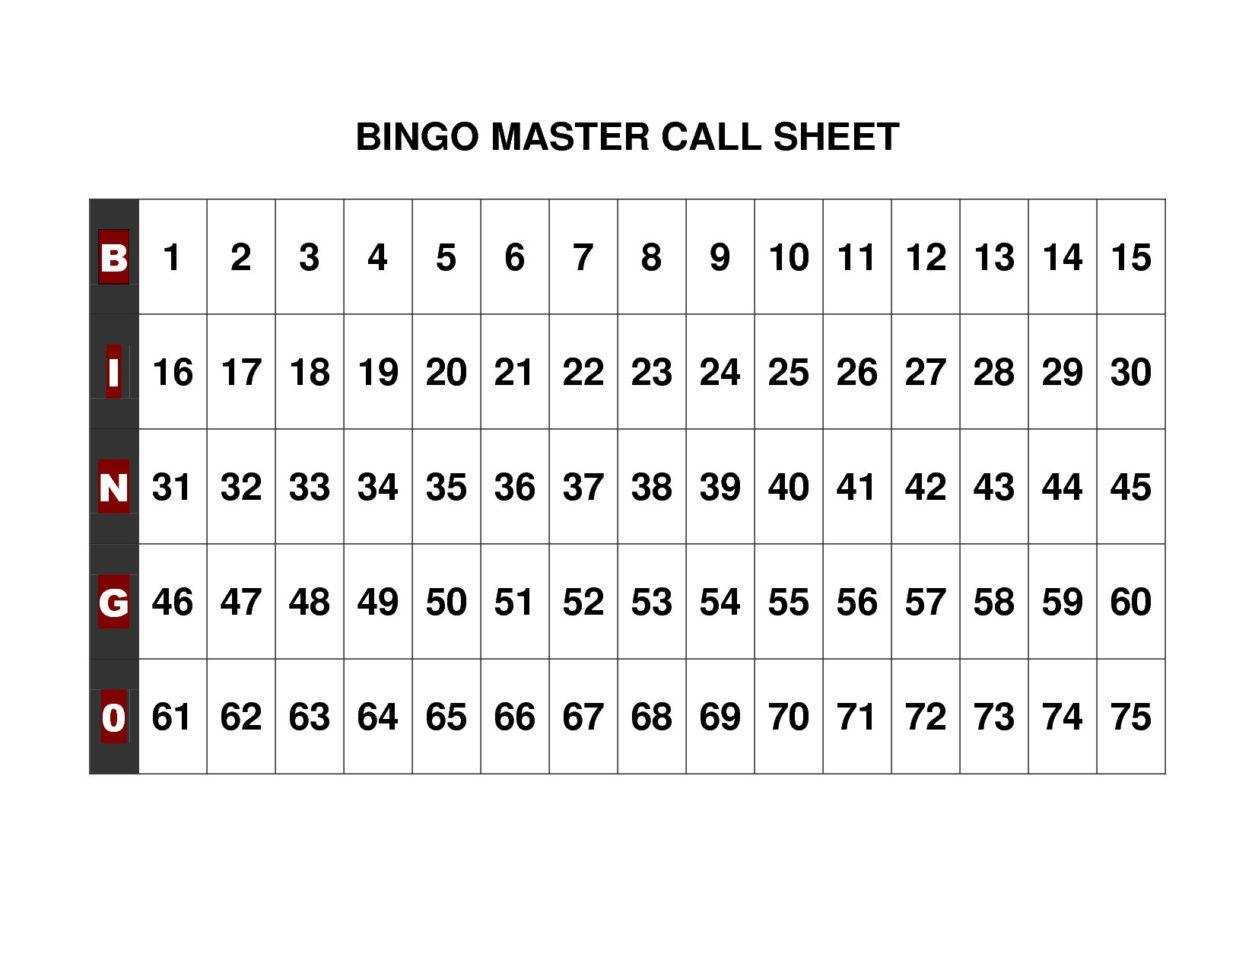 Bingo Spreadsheet Regarding Bingo Spreadsheet – Spreadsheet Collections